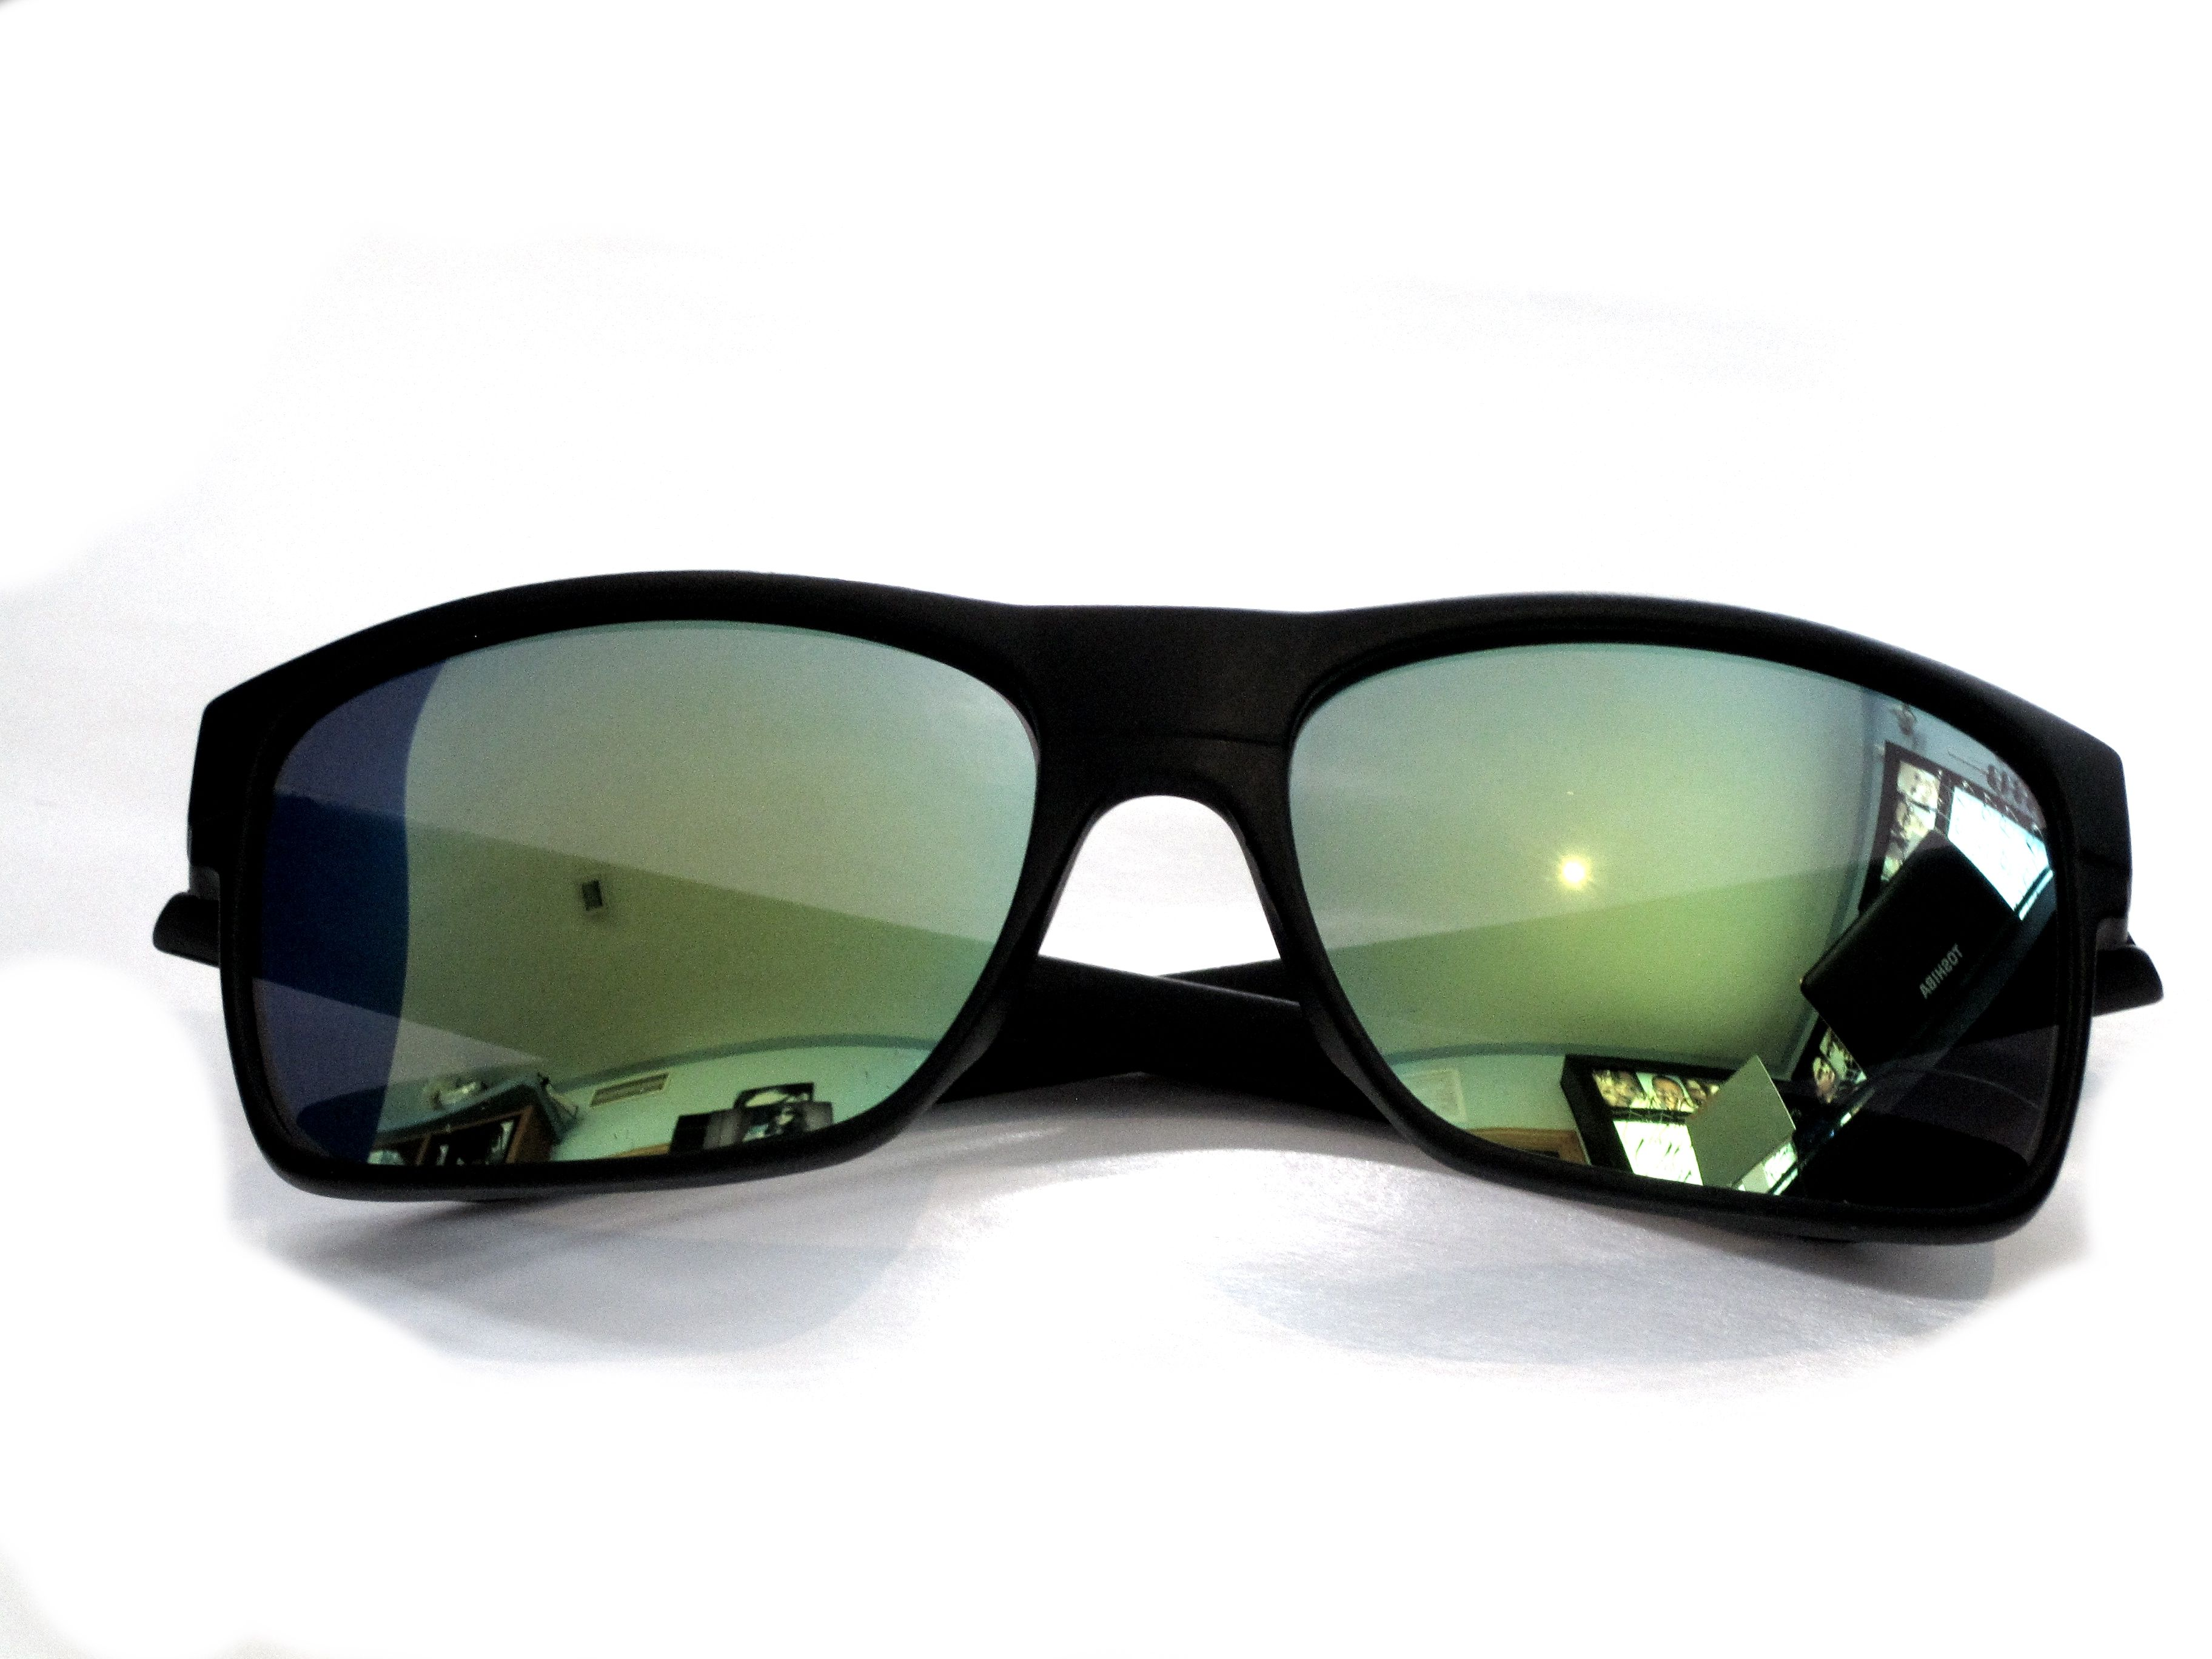 Gafas de sol, modelo LAS VEGAS, monturas de color negro mate, con ...